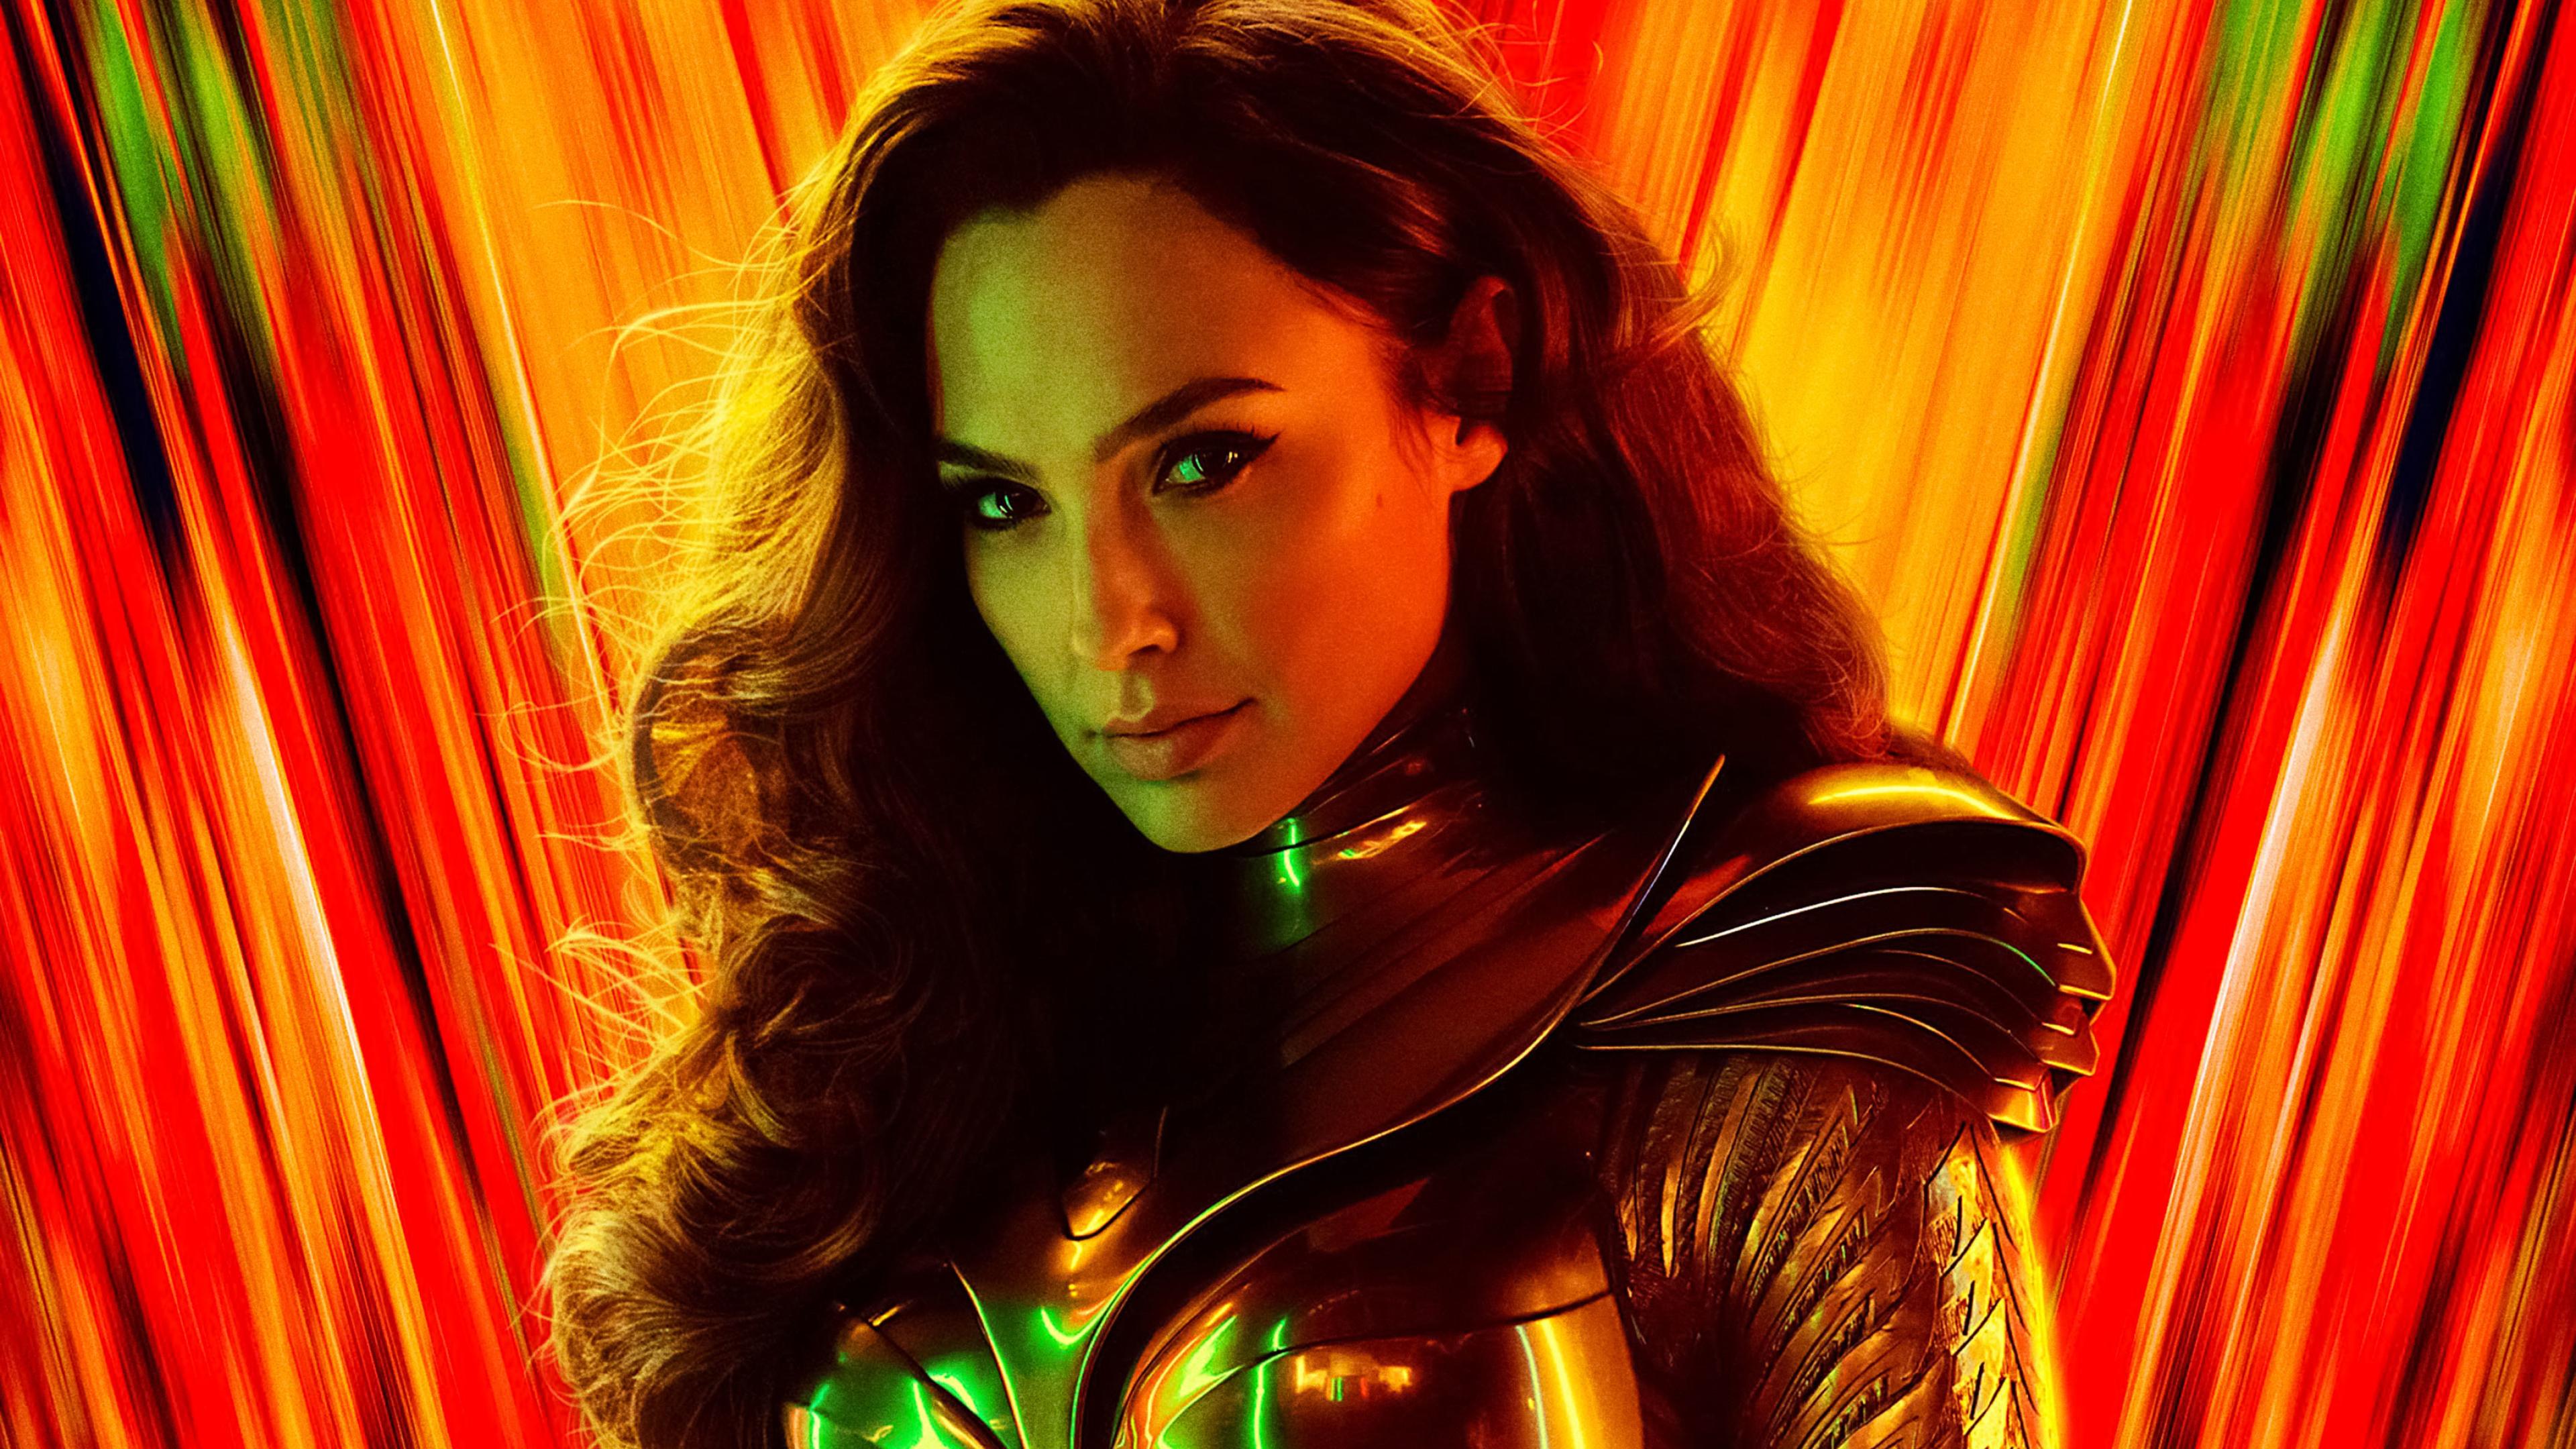 3840x2160 Wonder Woman 2 4k Wallpaper Hd Movies 4k Wallpapers